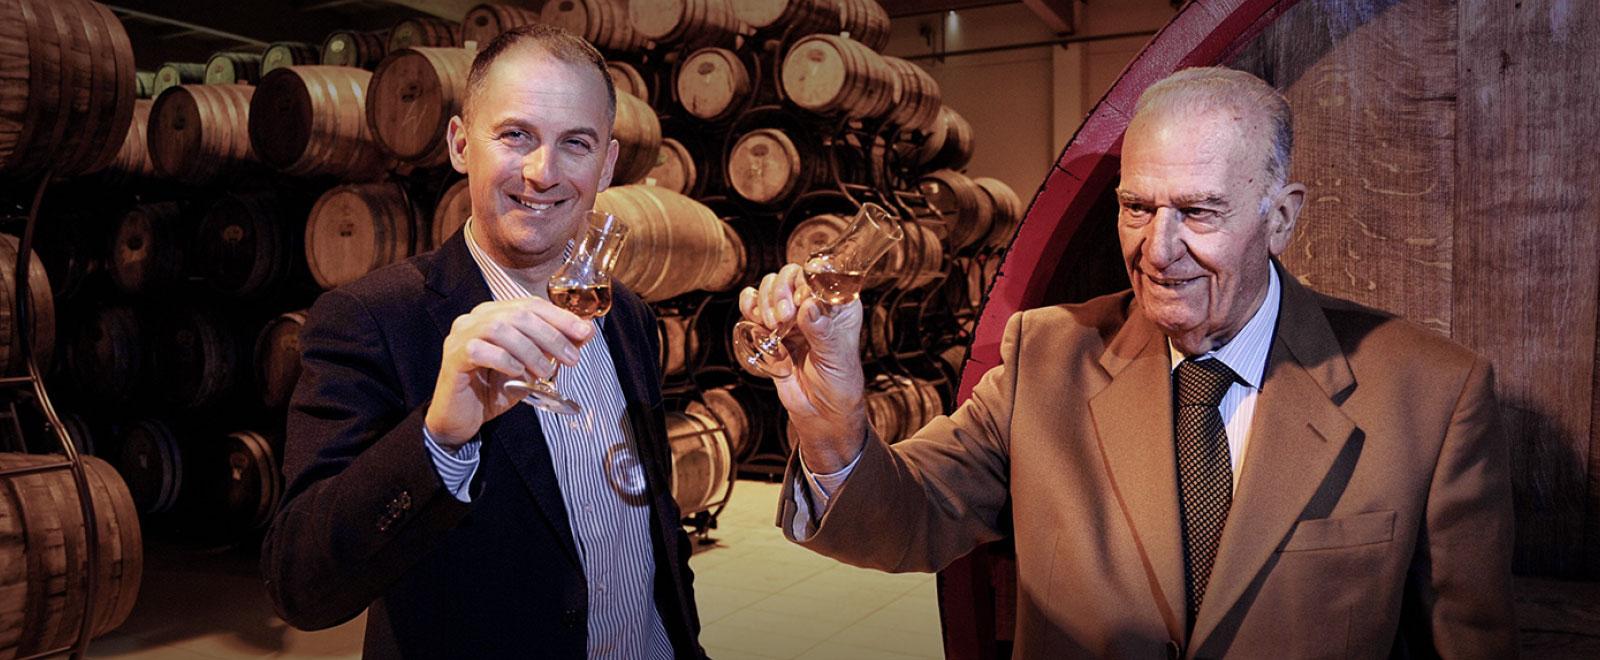 Famiglia Sibona - Distilleria storica del Piemonte